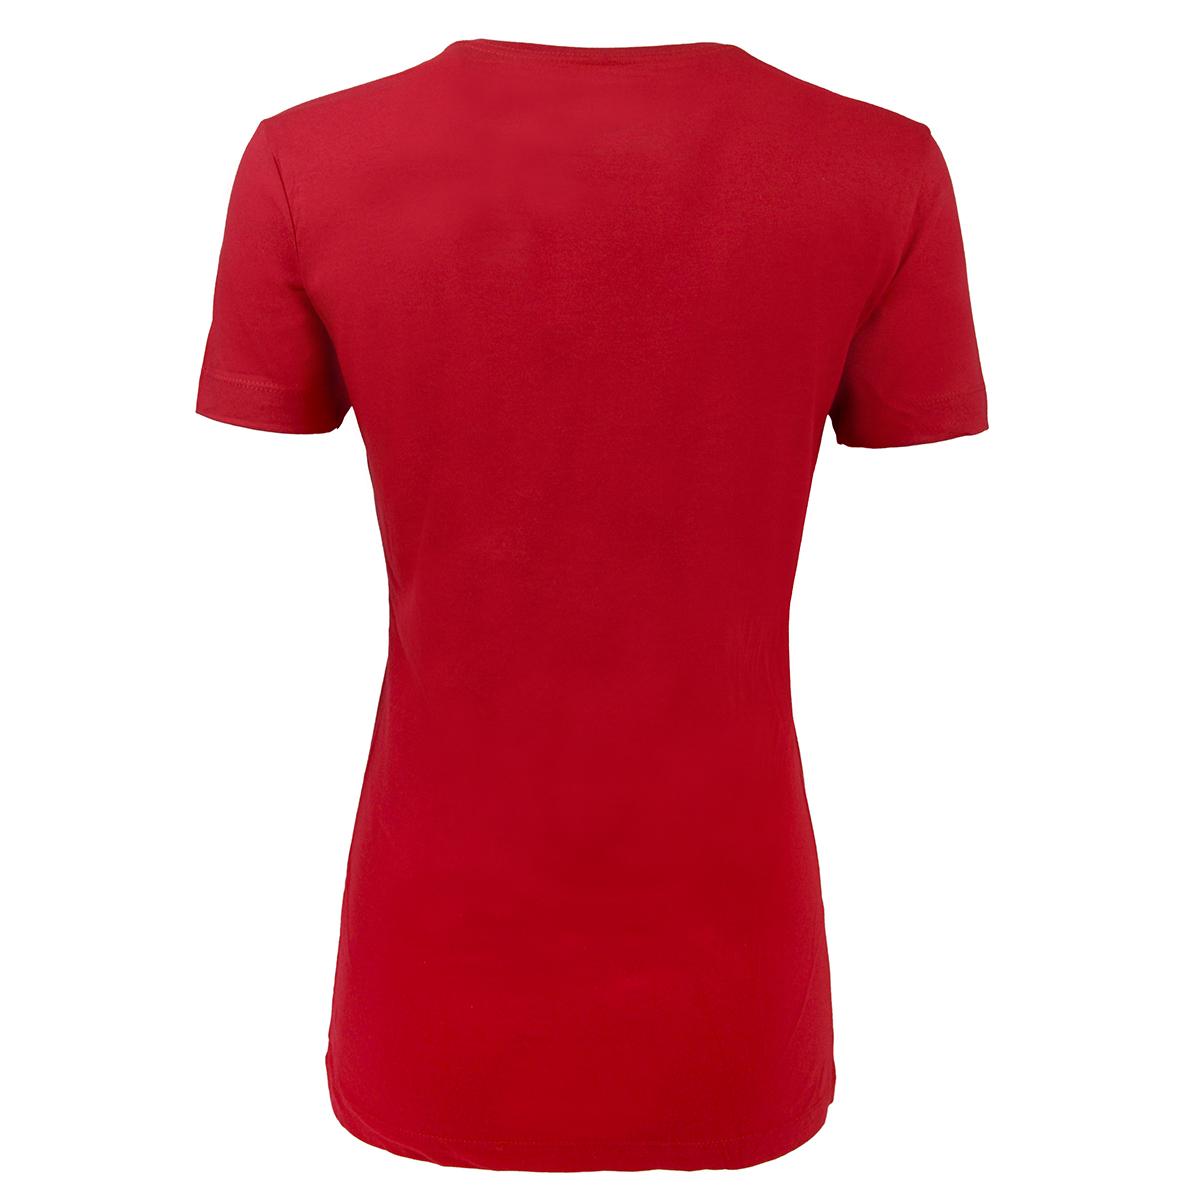 Nike-Women-039-s-Cotton-Slim-Fit-T-Shirt thumbnail 19